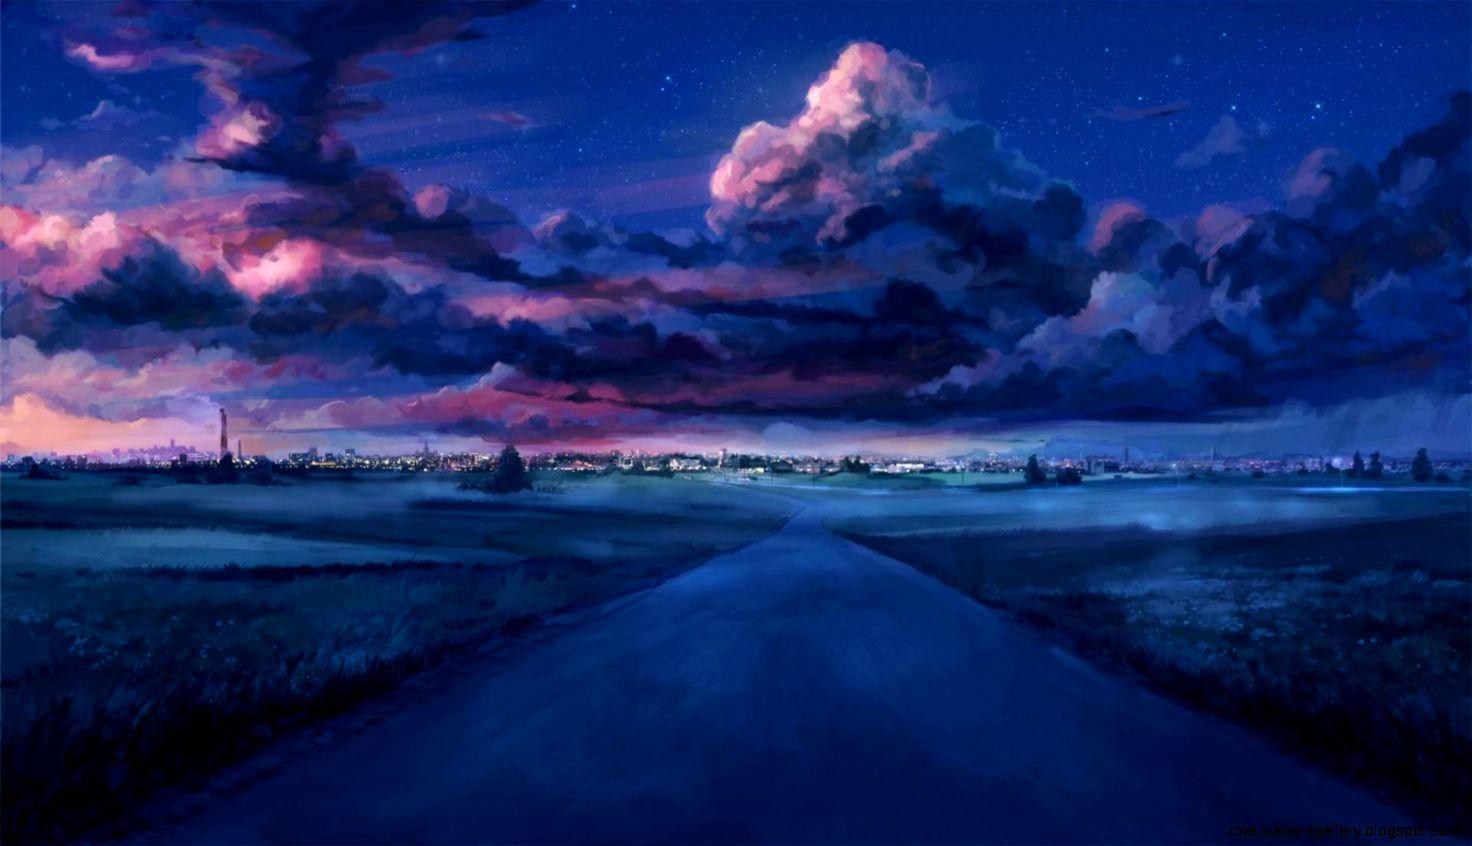 Anime Night Sky HD Wallpaper  1920x1080  ID51716